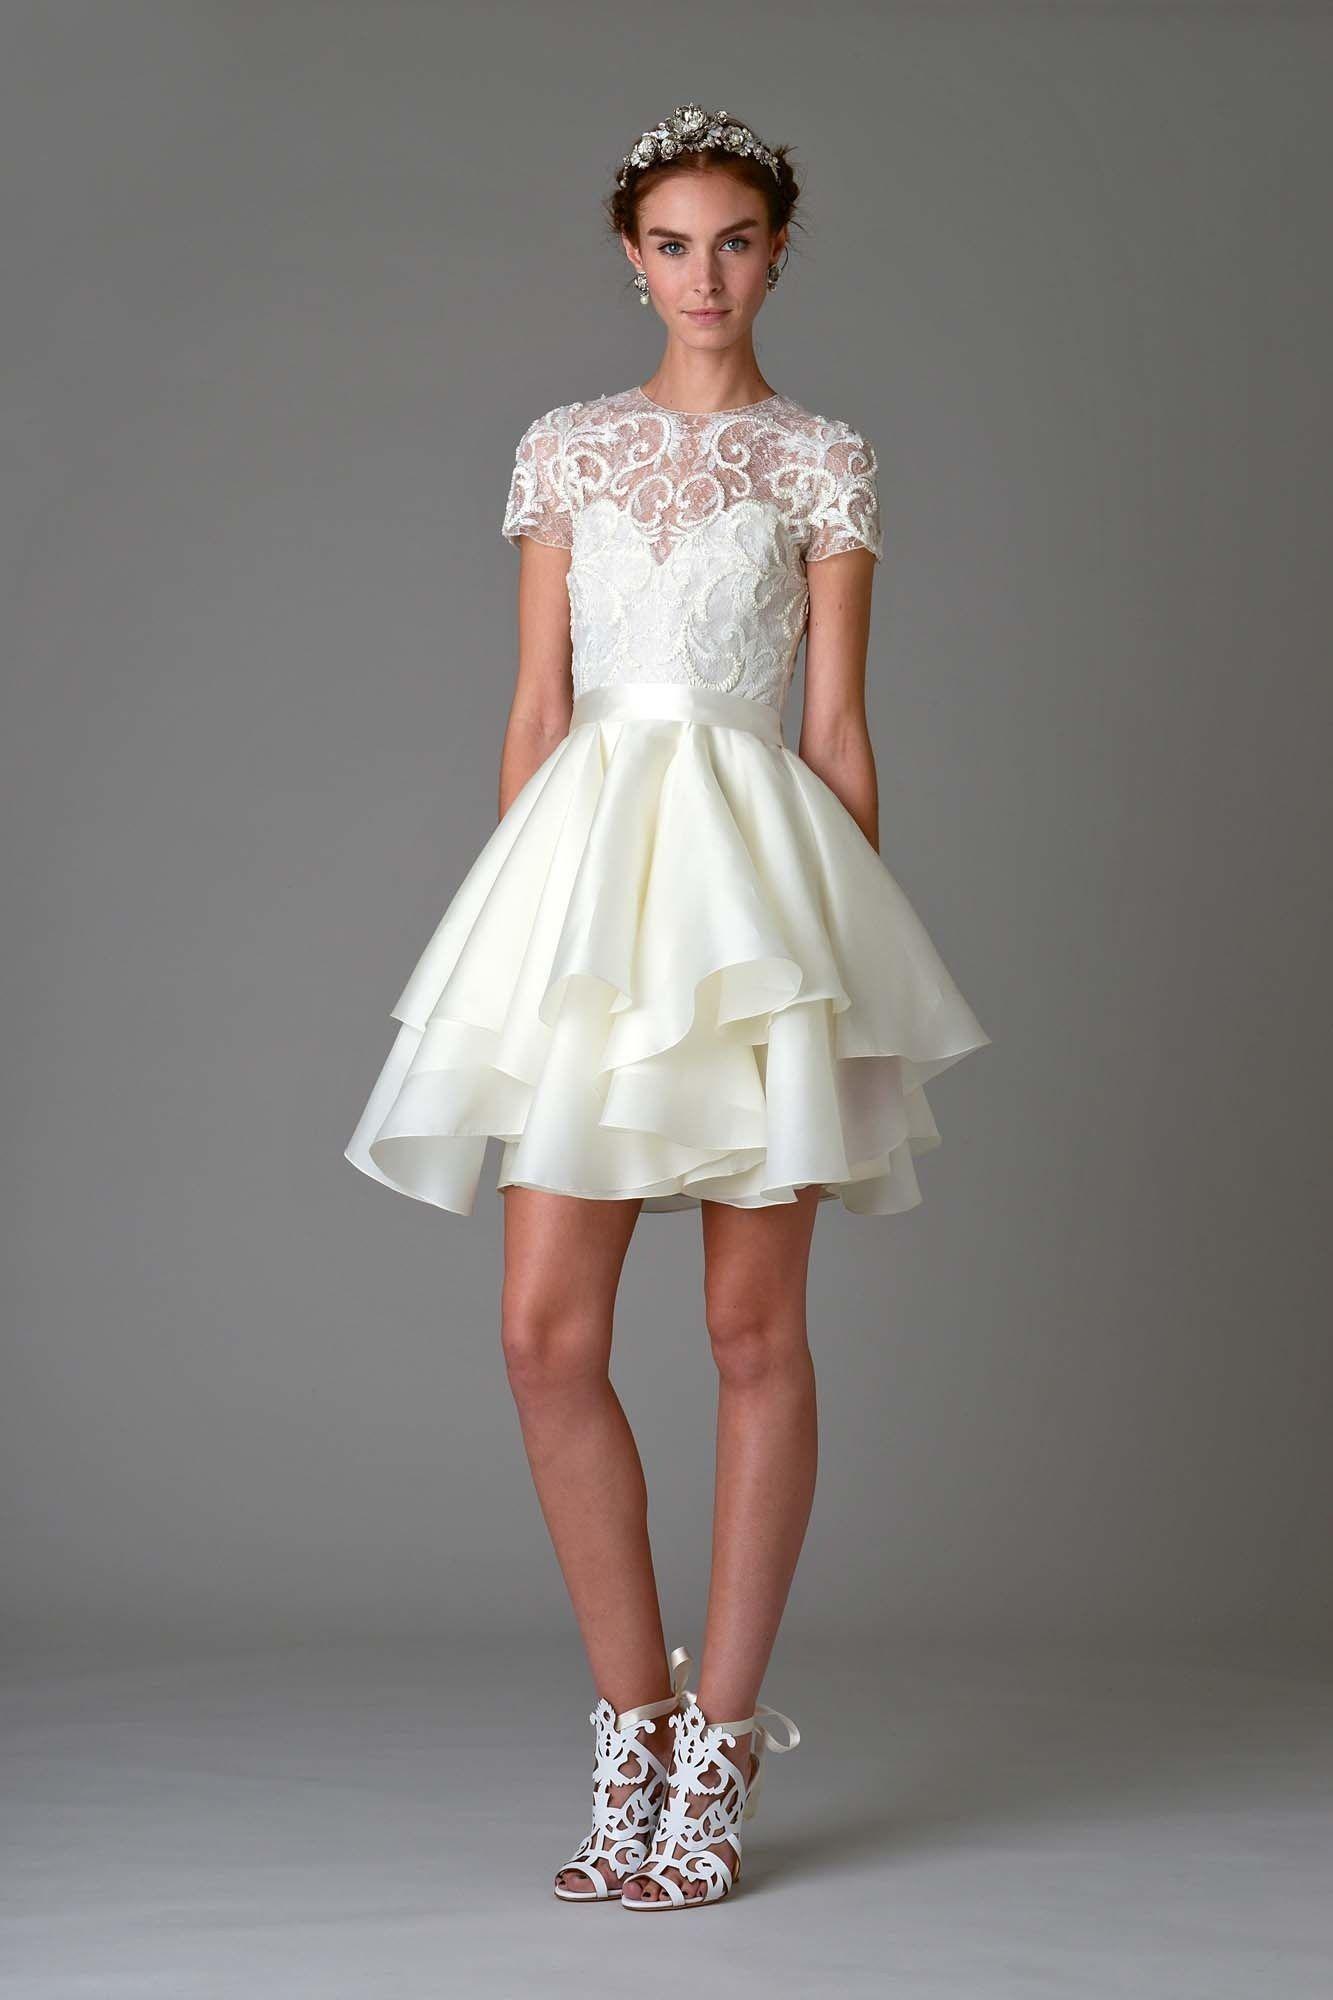 Zdroj fotky: http://www.vogue.com/fashion-shows/bridal-fall-2016/marchesa/slideshow/collection